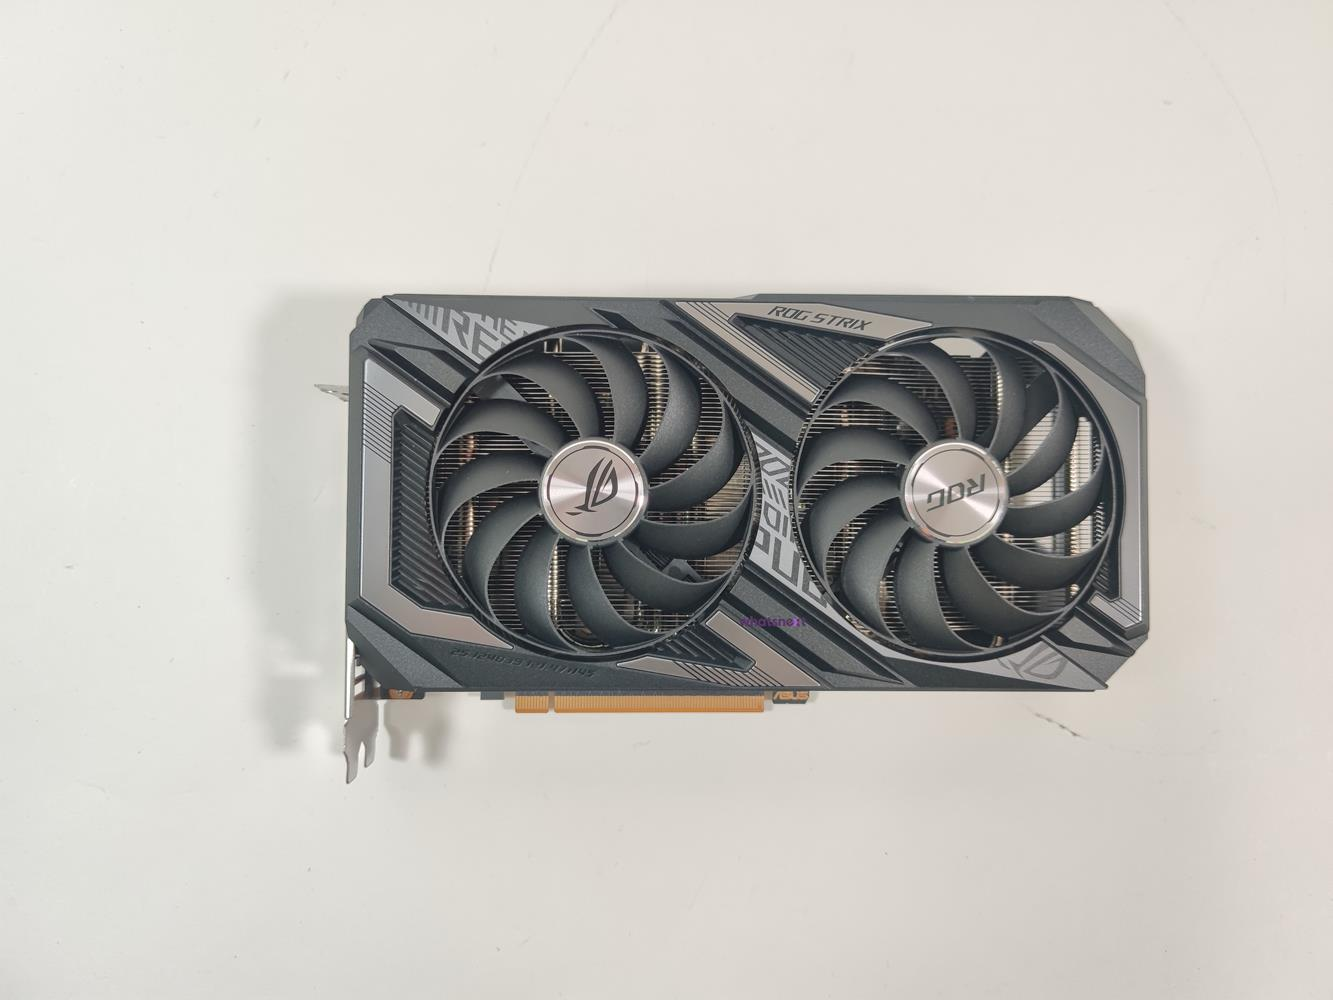 test Asus Radeon RX 6600 XT ROG Strix OC, recenzja Asus Radeon RX 6600 XT ROG Strix OC, opinia Asus Radeon RX 6600 XT ROG Strix OC